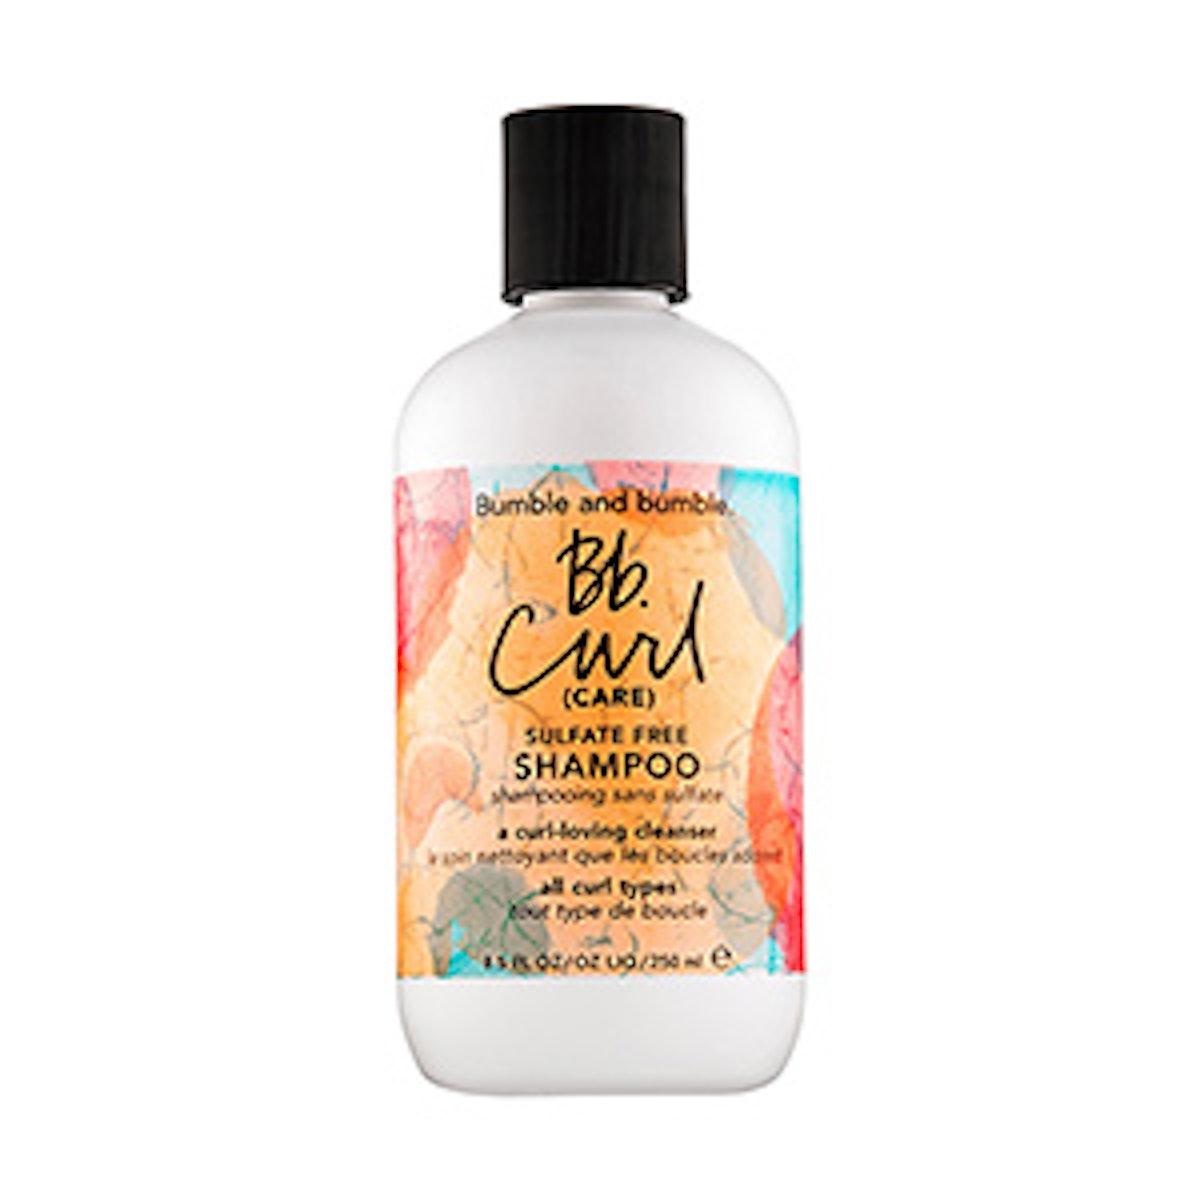 Bb Curl Care Shampoo